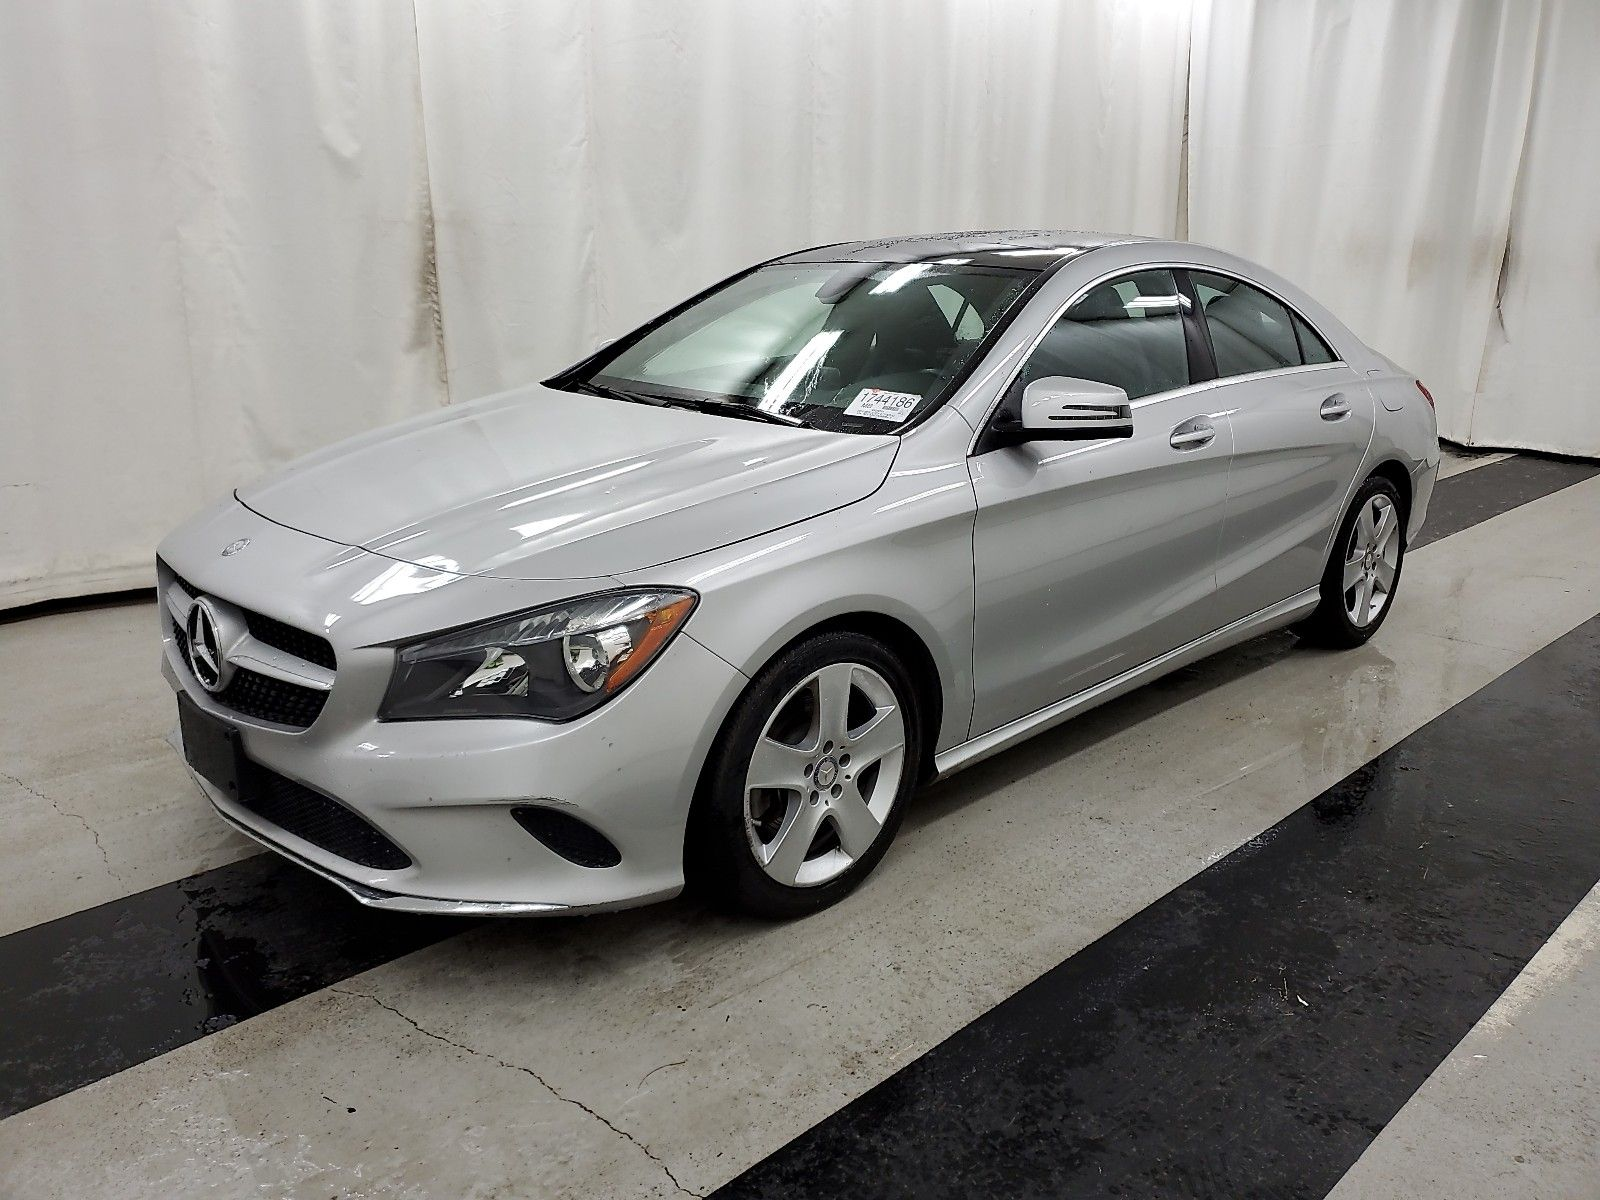 2018 Mercedes-benz Cla 2.0. Lot 99912200853 Vin WDDSJ4EBXJN508476